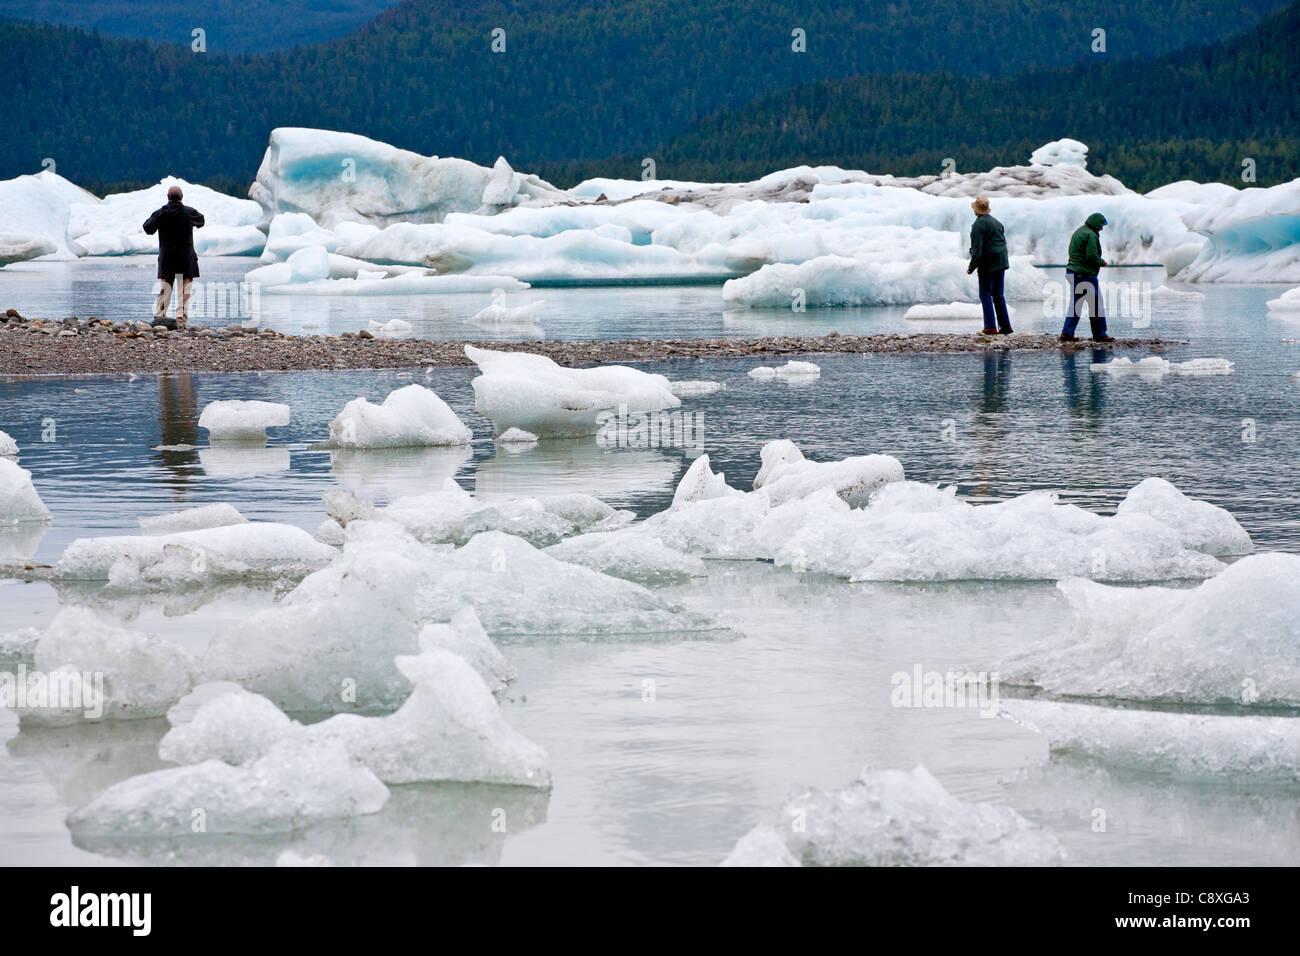 People and icebergs. Mendenhall Glacier lake. Juneau. Alaska. USA - Stock Image